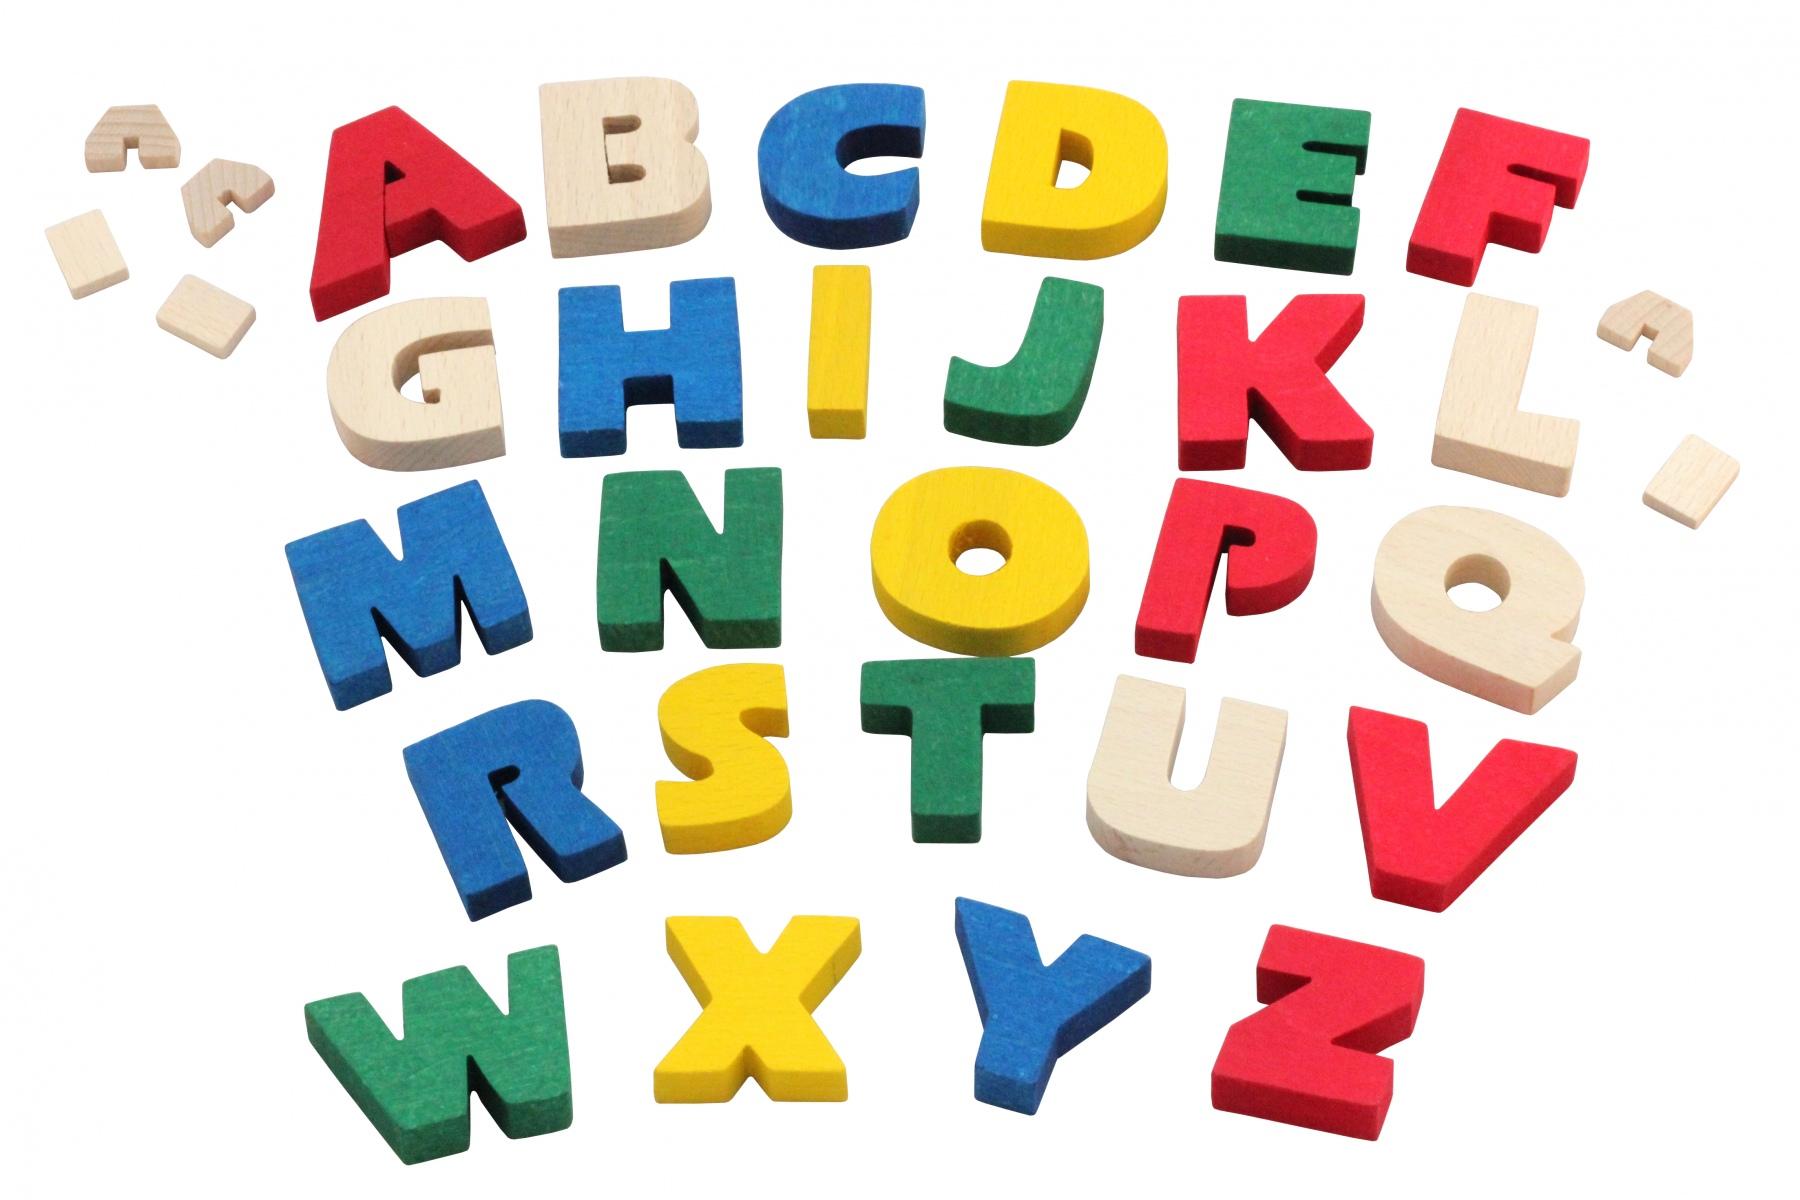 jeux ducatifs alphabet en bois massif fabriqu en europe. Black Bedroom Furniture Sets. Home Design Ideas